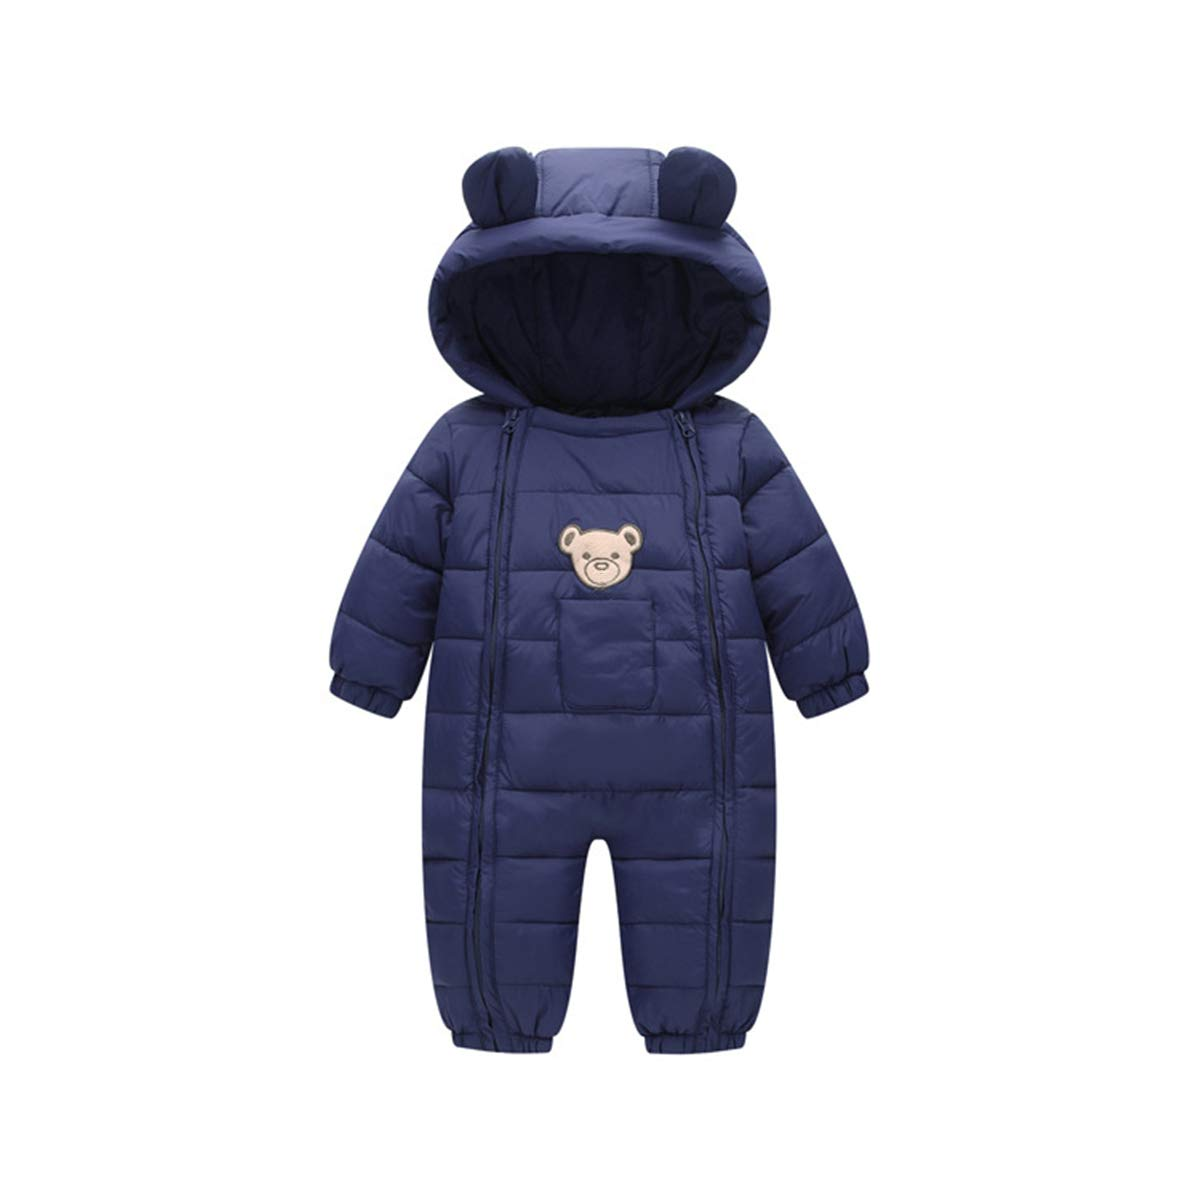 ELIKIDSTO Baby Boys Winter Puffer Snowsuit Jumpsuit Long Sleeve Hooded Winter Romper Onesie for Baby Girls Navy Blue 18-24 Months by ELIKIDSTO